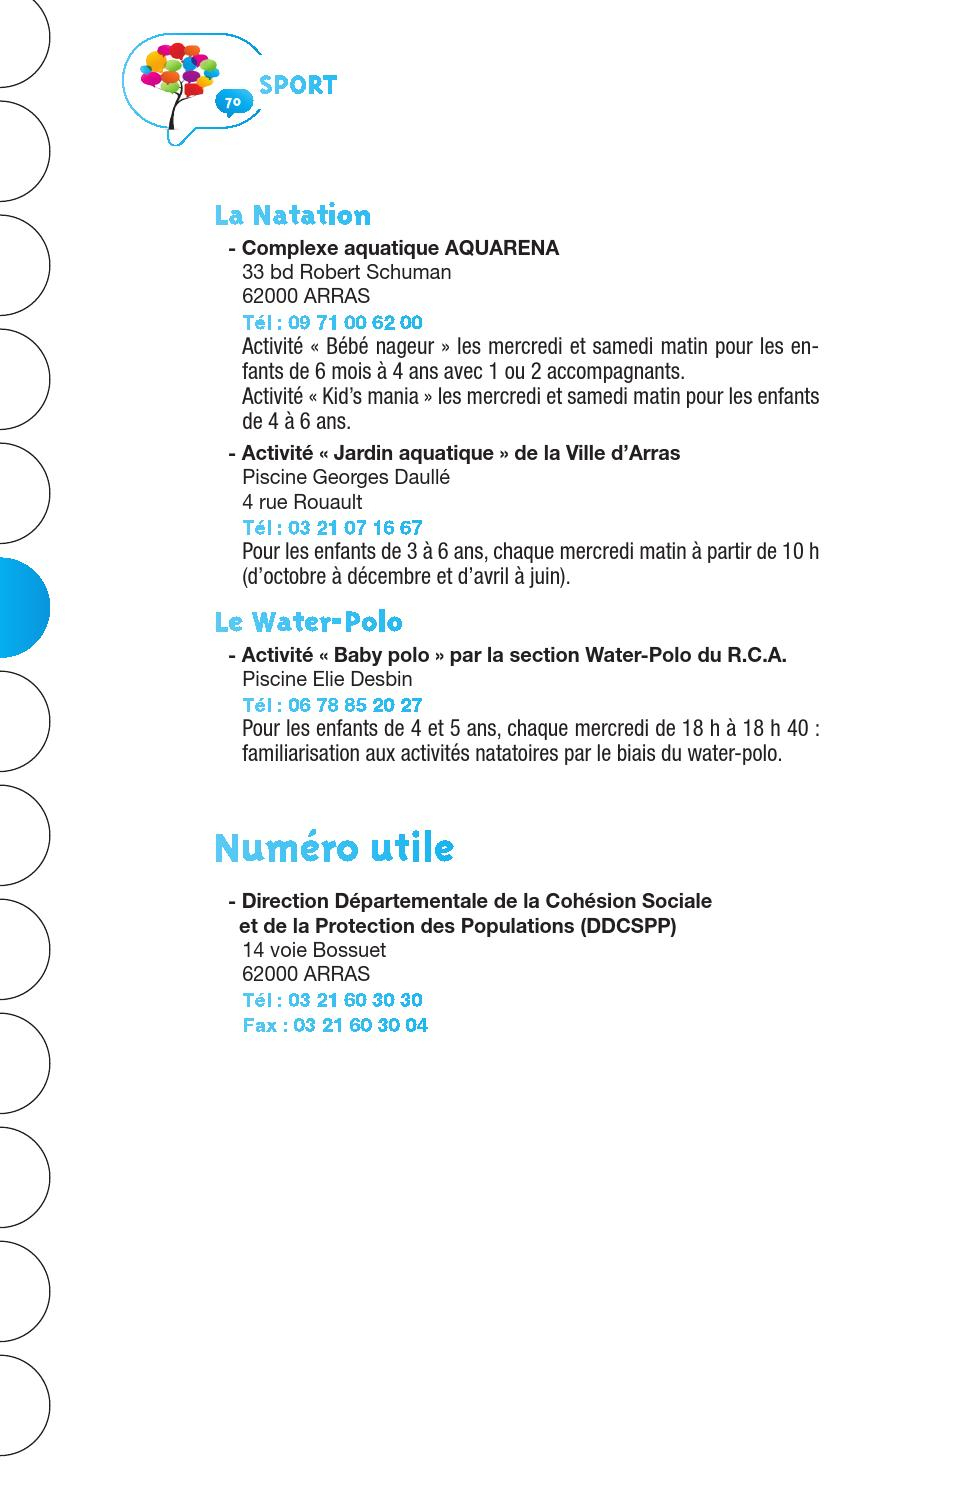 Arras Services 2015 By Mairie D'arras - Issuu pour Piscine Arras Aquarena